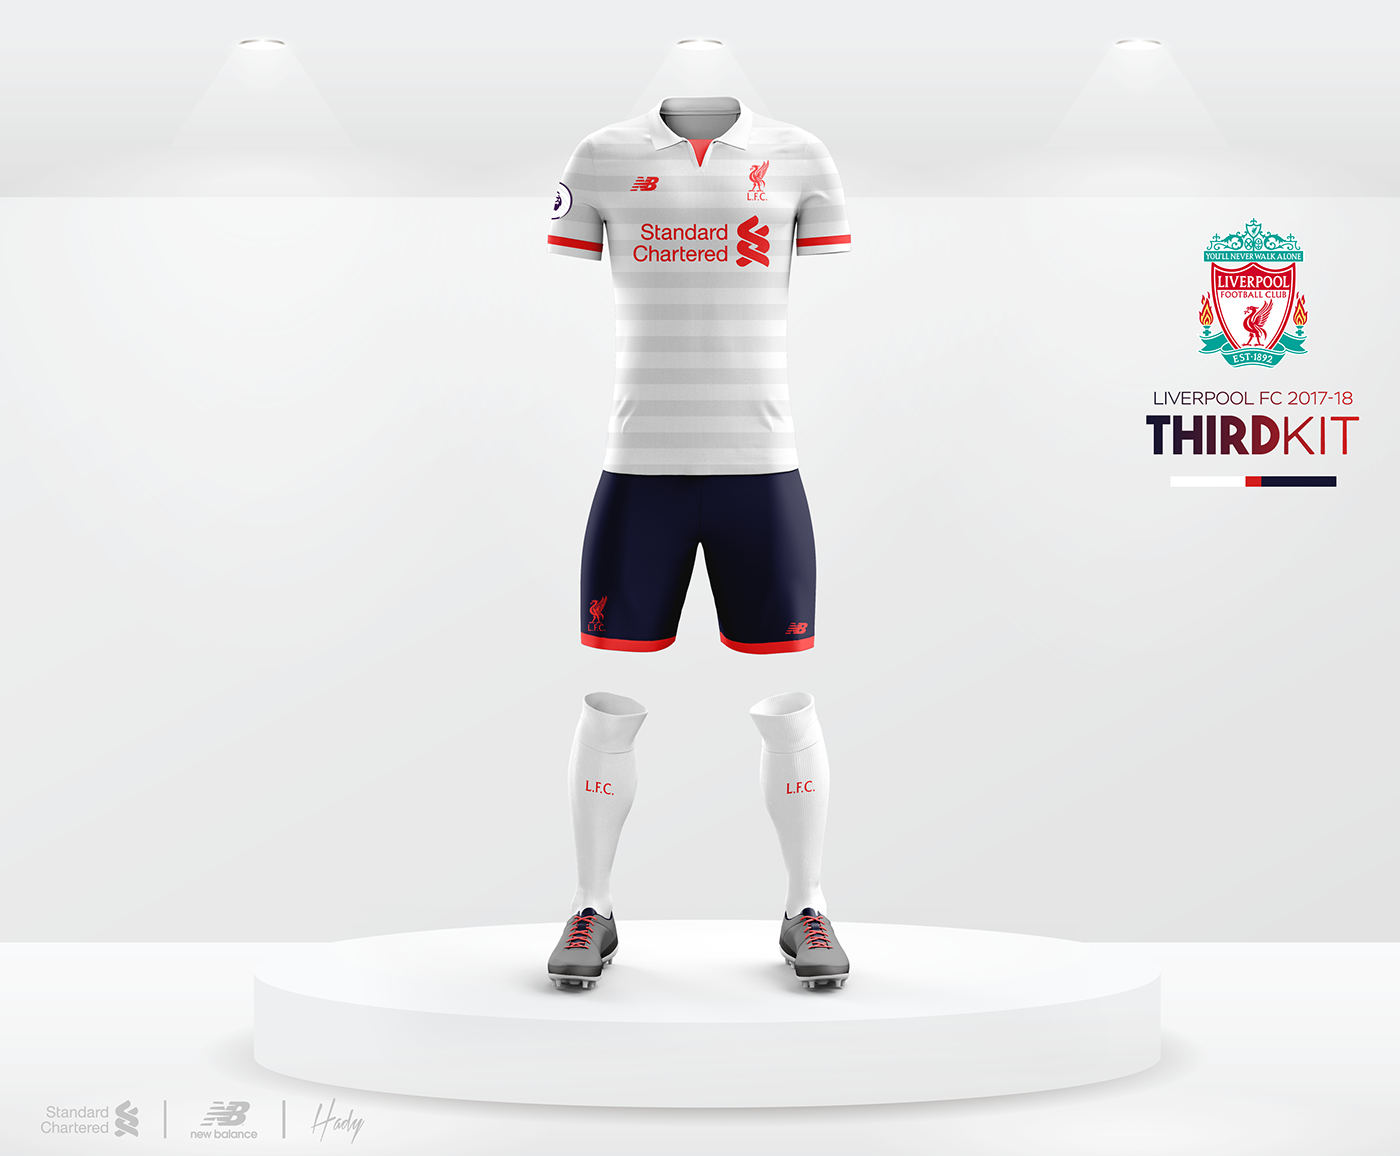 7e87a3559 Liverpool Football Club 2017-18 Kits Concept.